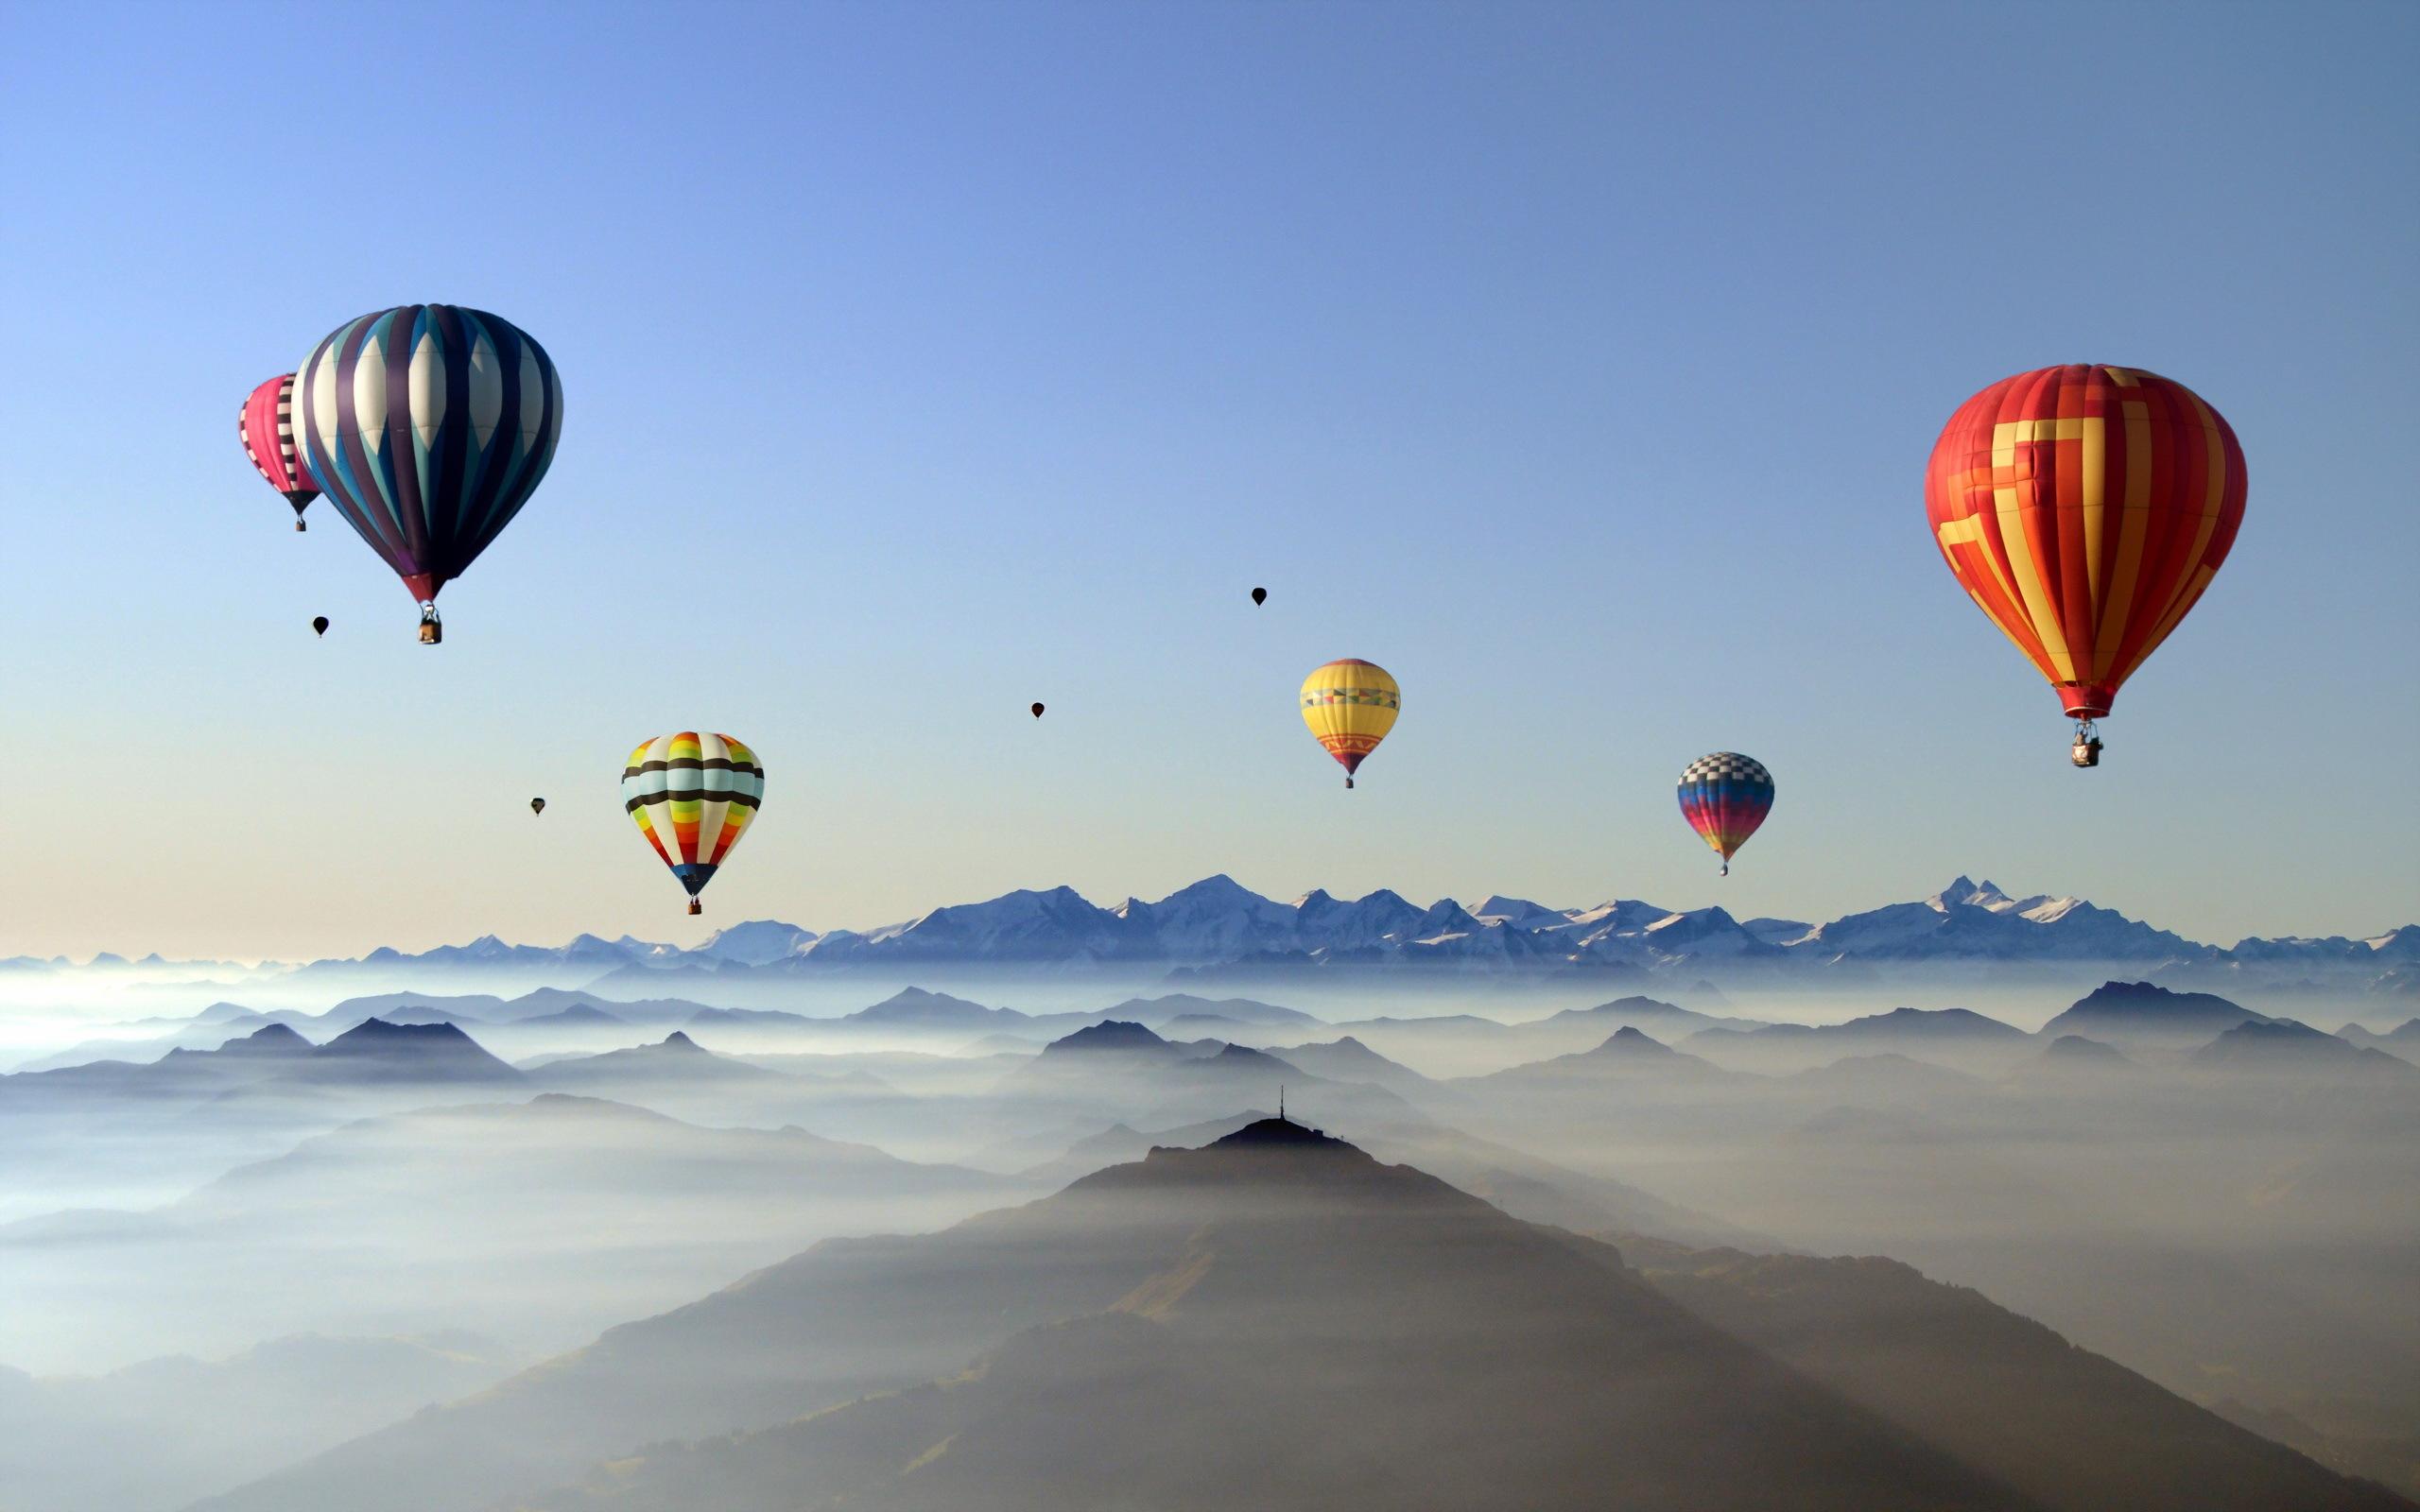 Hot air balloon hd wallpaper background image 2560x1600 id 361547 wallpaper abyss - Air wallpaper hd ...